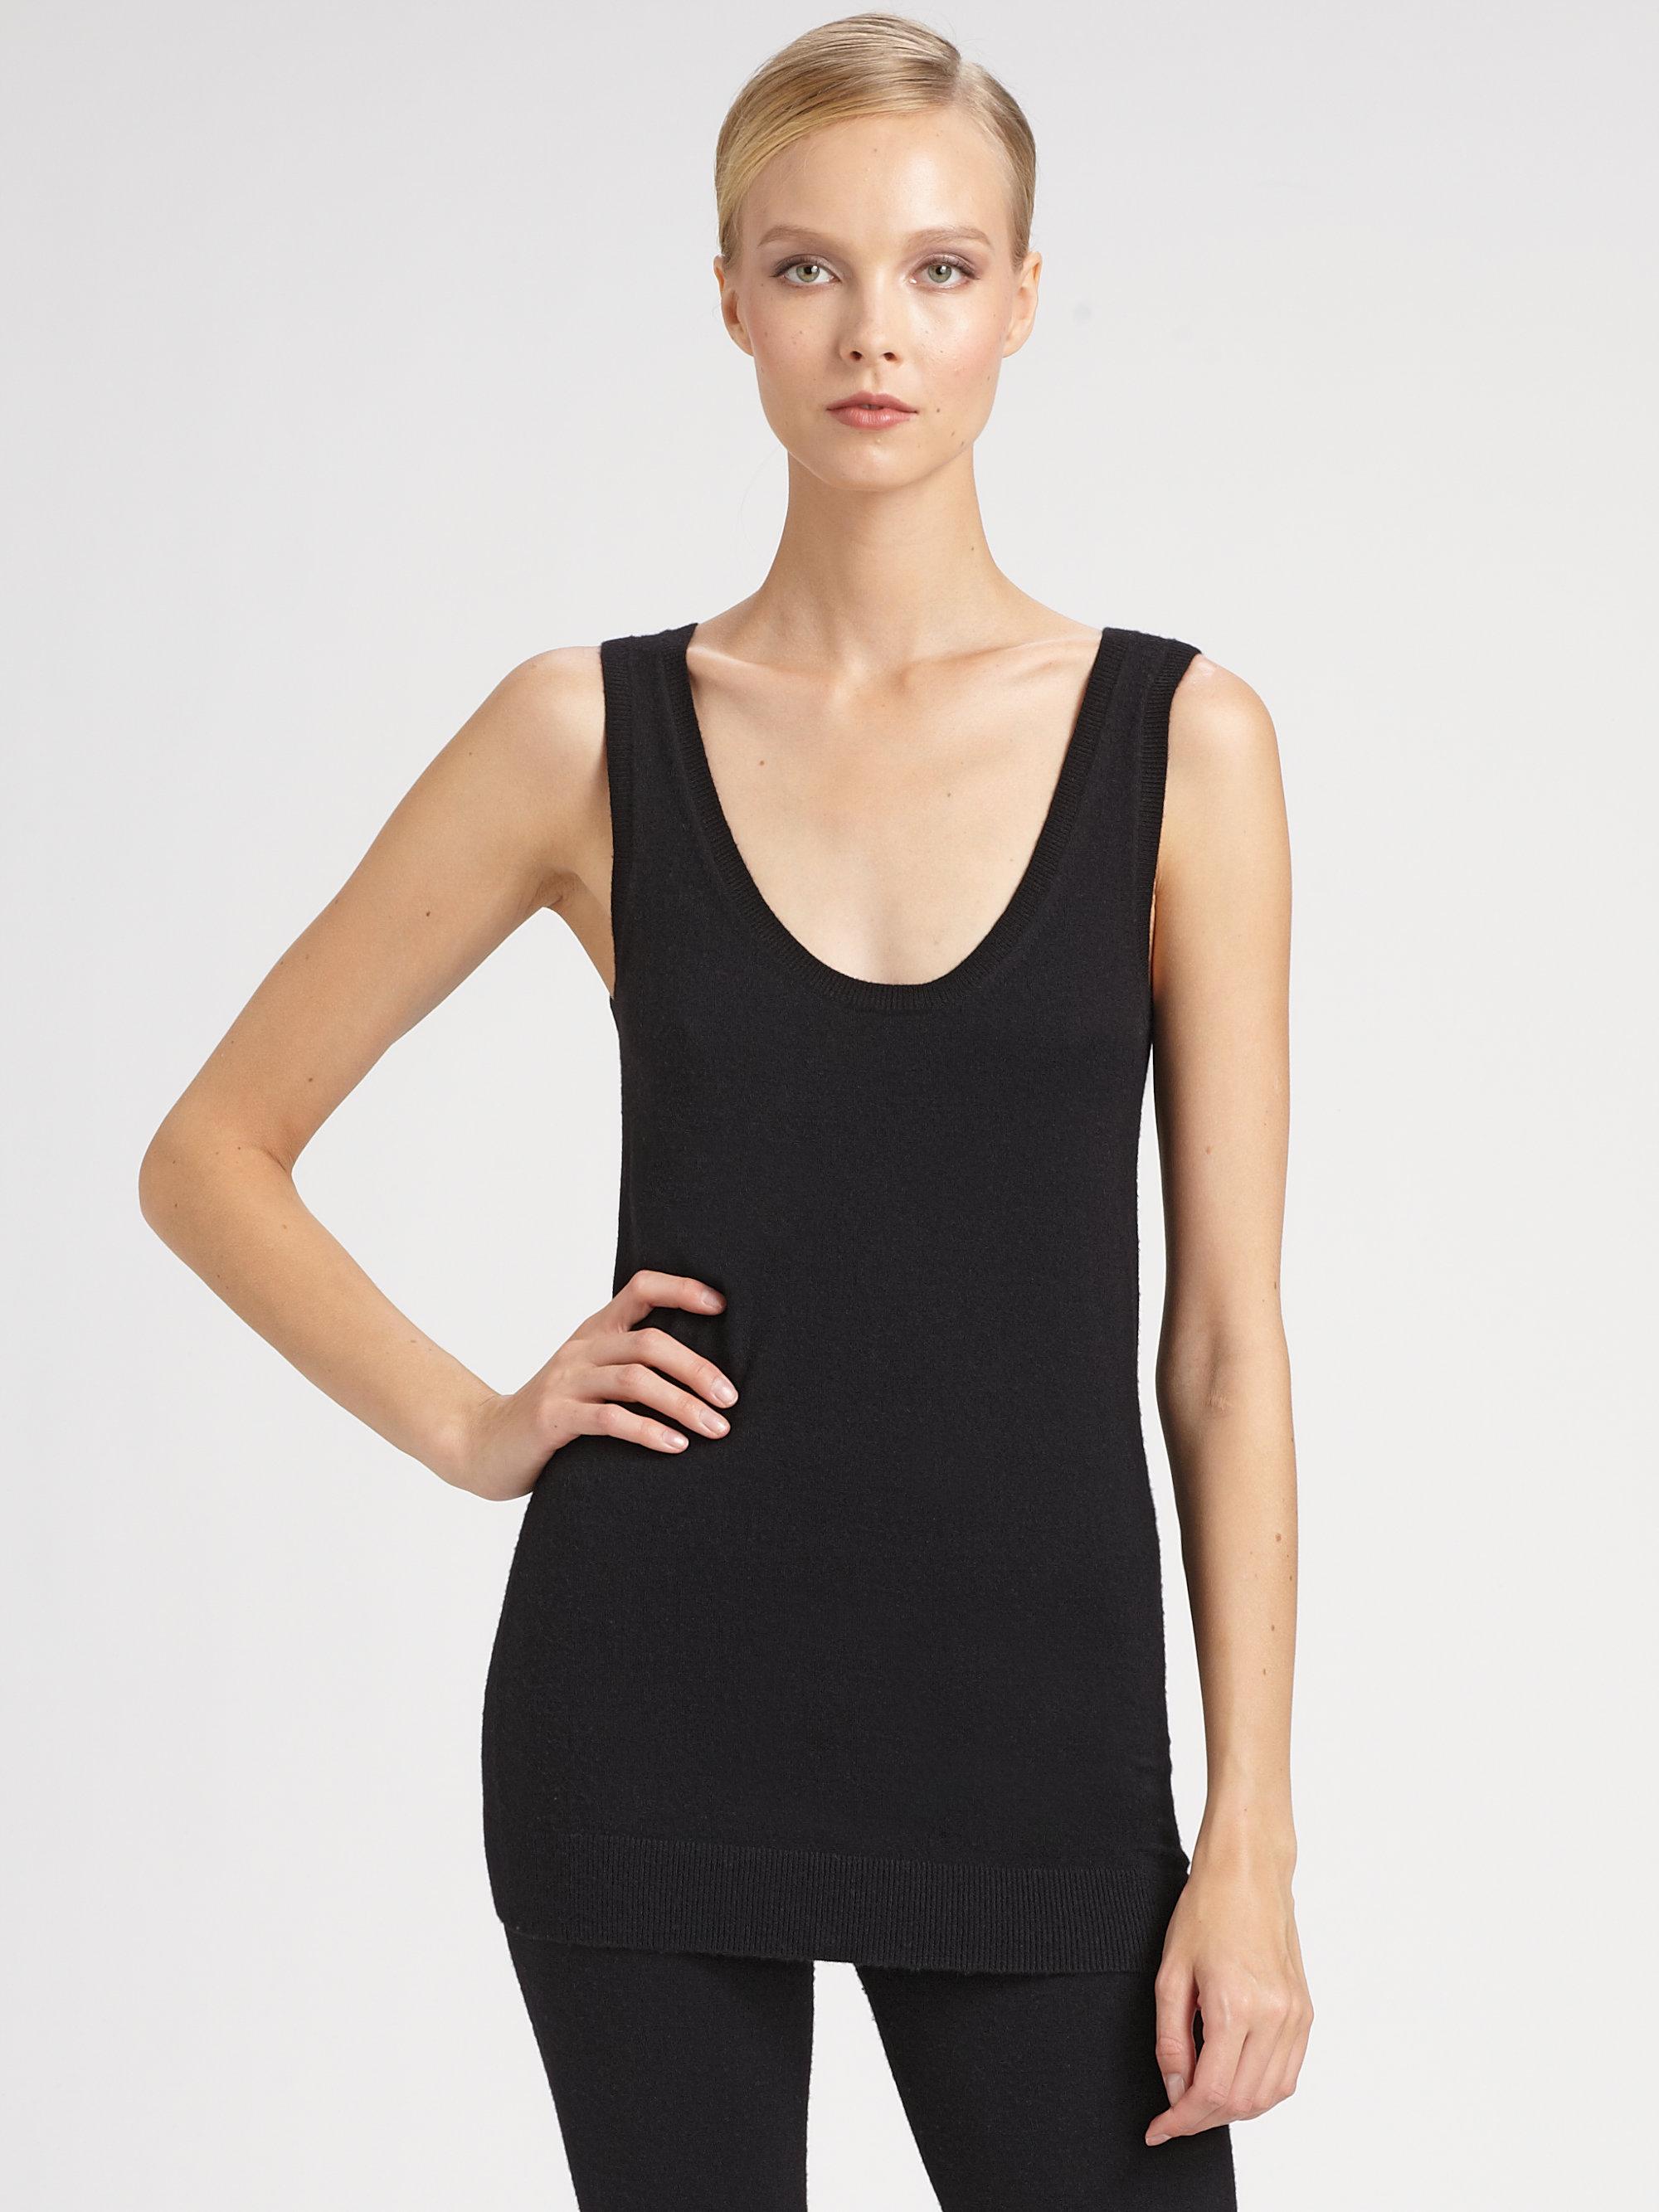 Donna karan new york first layer cashmere tank in black lyst for Donna karan new york